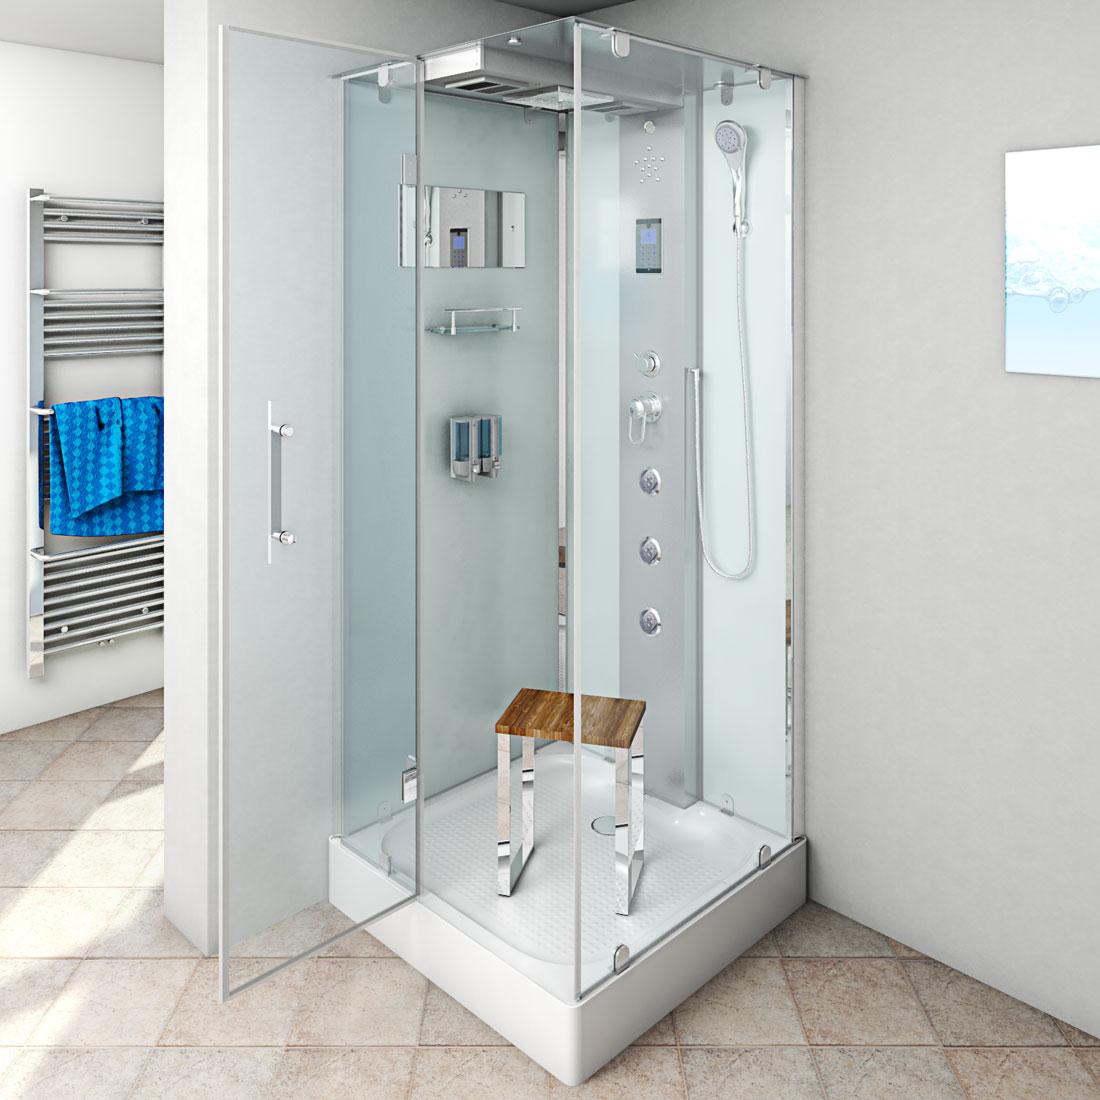 acquavapore dtp6038 0002l dusche dampfdusche duschtempel duschkabine 80x80 ebay. Black Bedroom Furniture Sets. Home Design Ideas